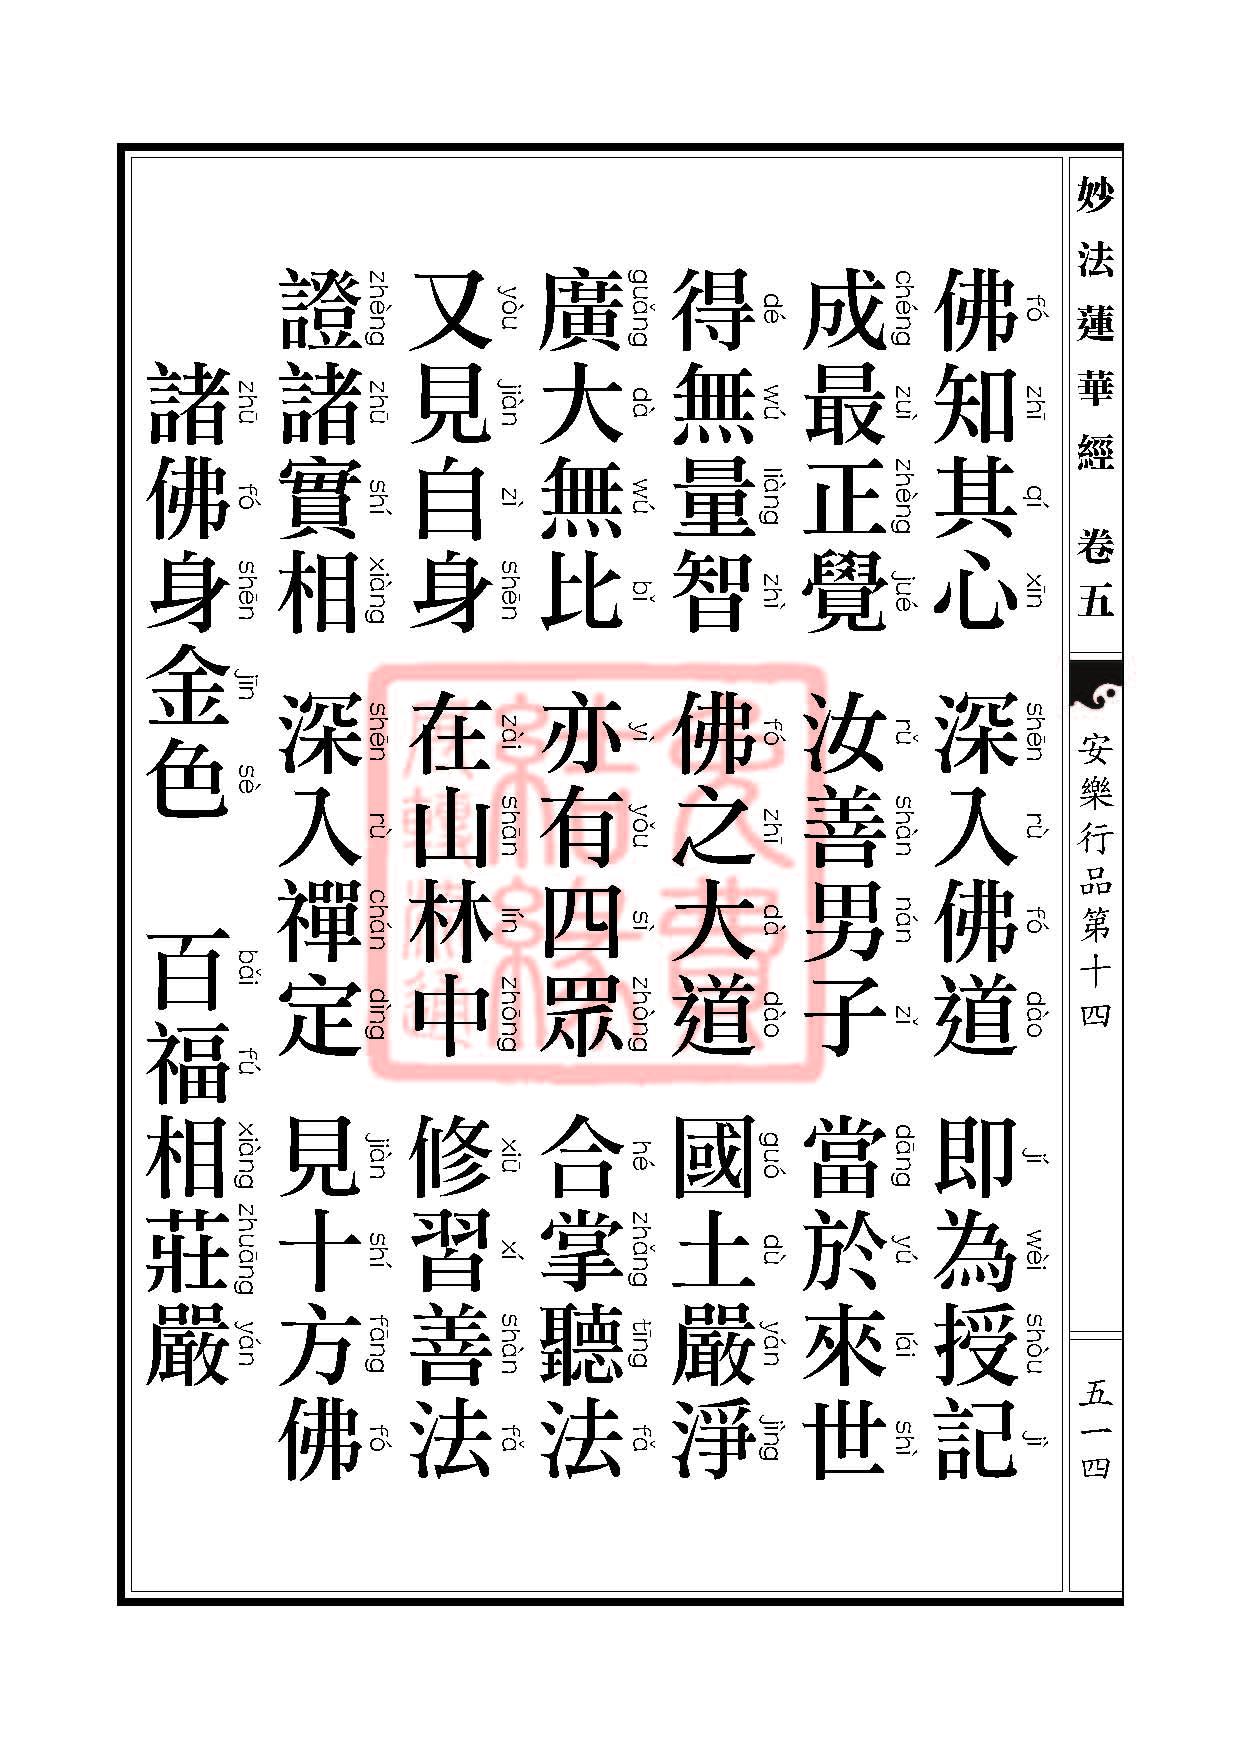 Book_FHJ_HK-A6-PY_Web_页面_514.jpg